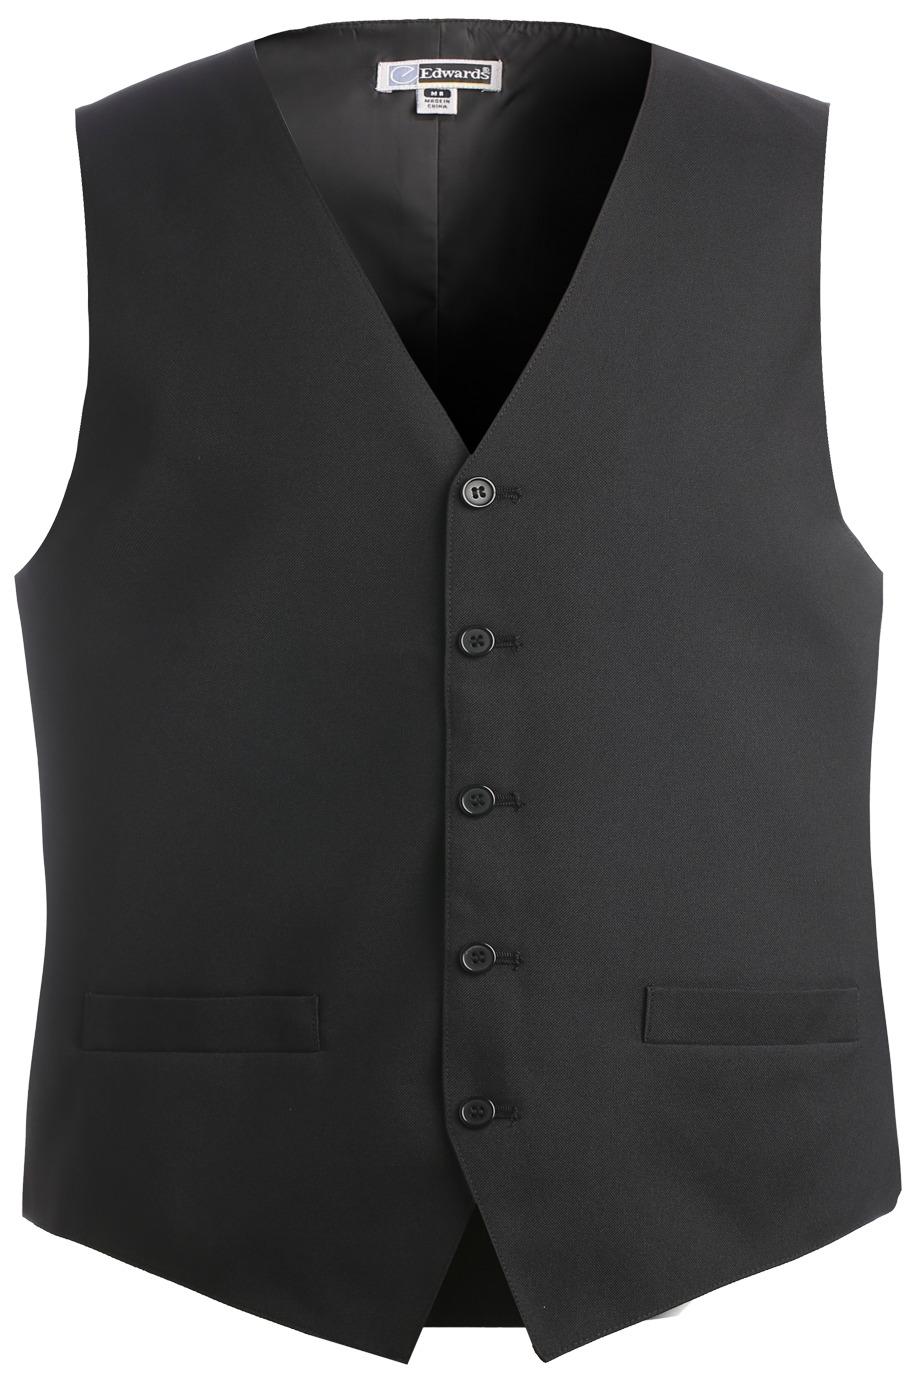 Server Vests and Jackets